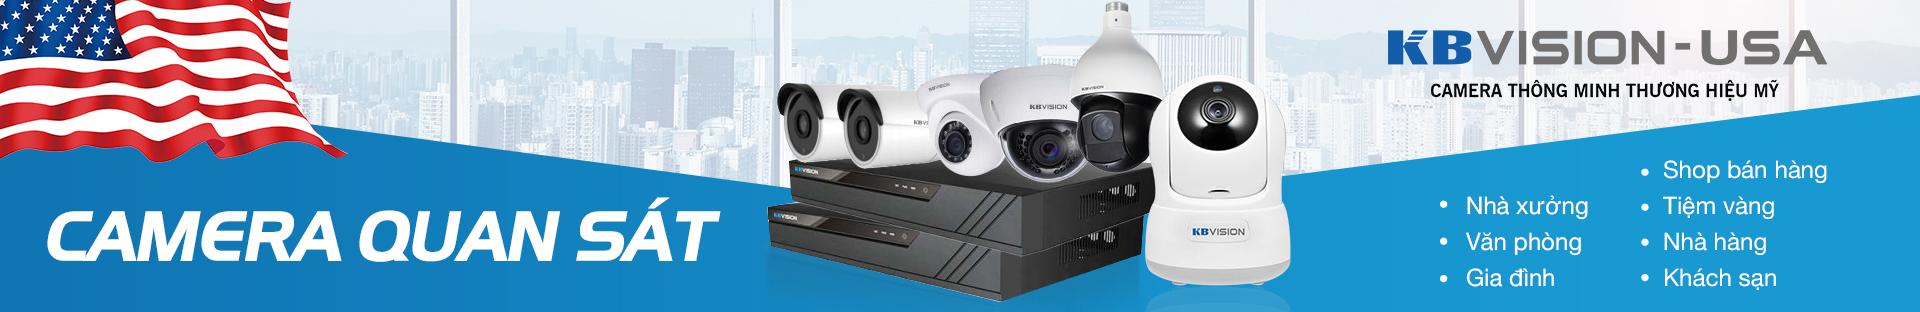 Bộ Camera Kbvision gia đình 2.0 Megapixcel